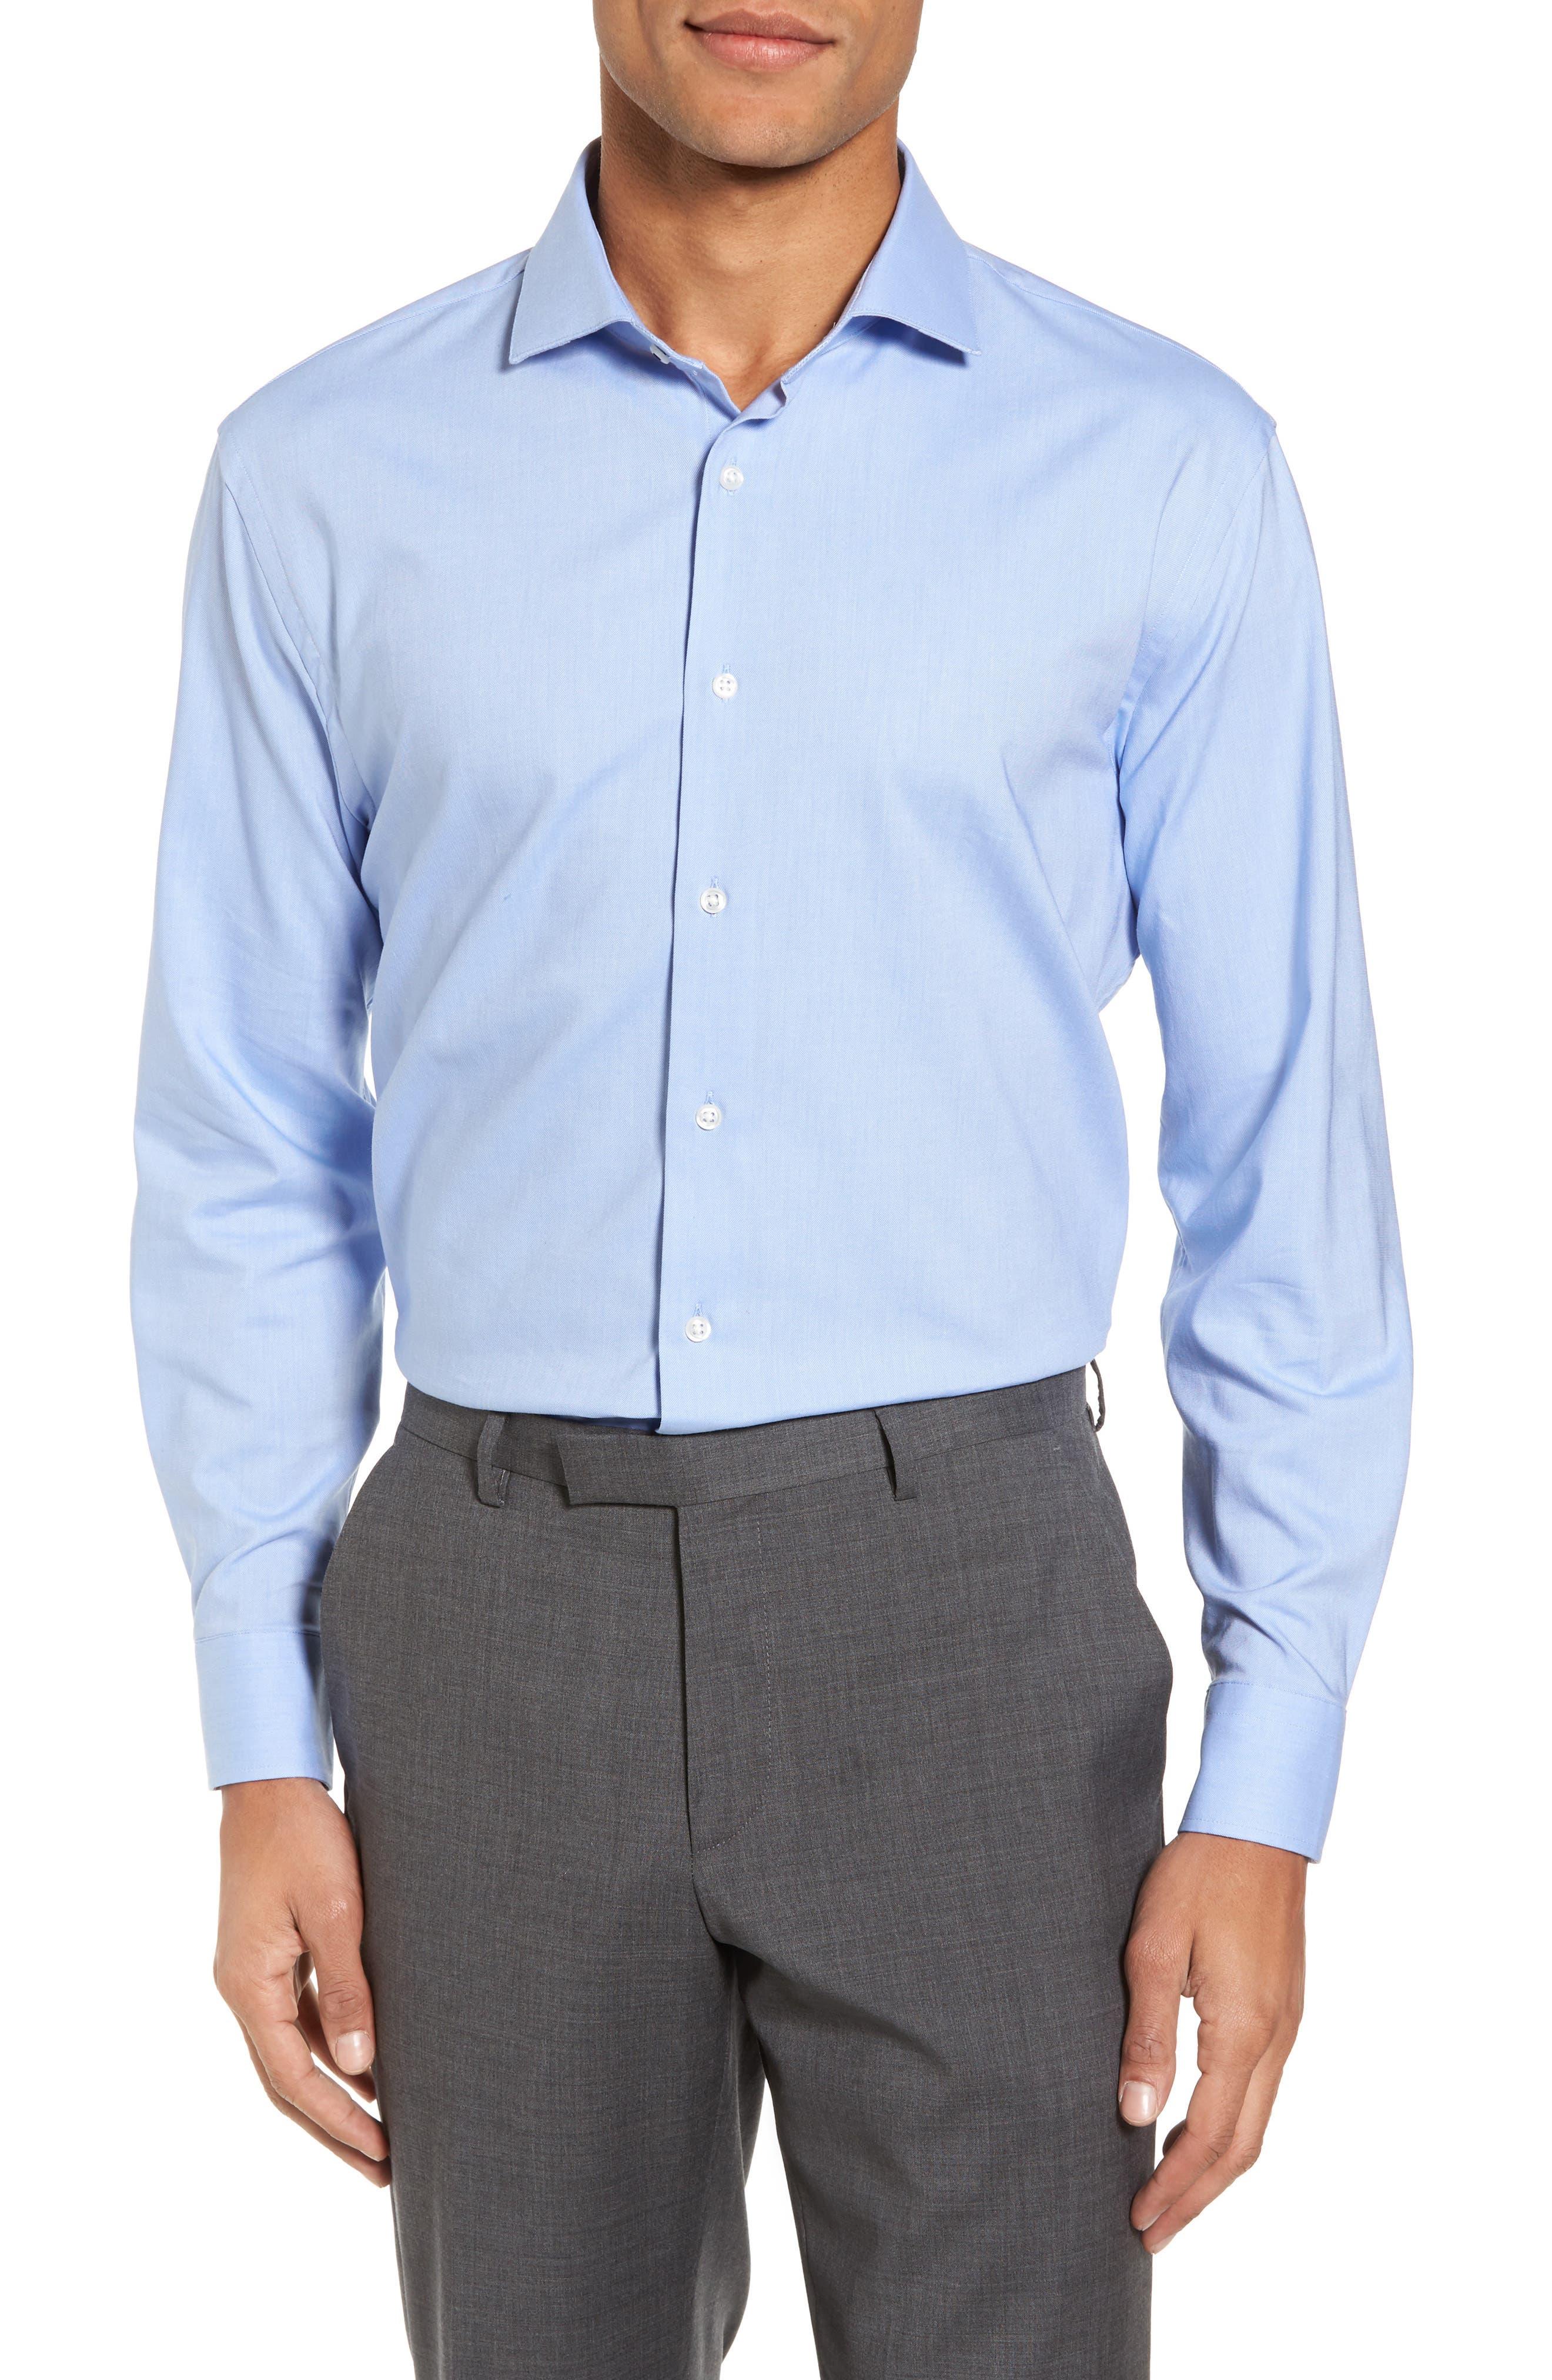 Main Image - Nordstrom Men's Shop Tech-Smart Trim Fit Stretch Solid Dress Shirt